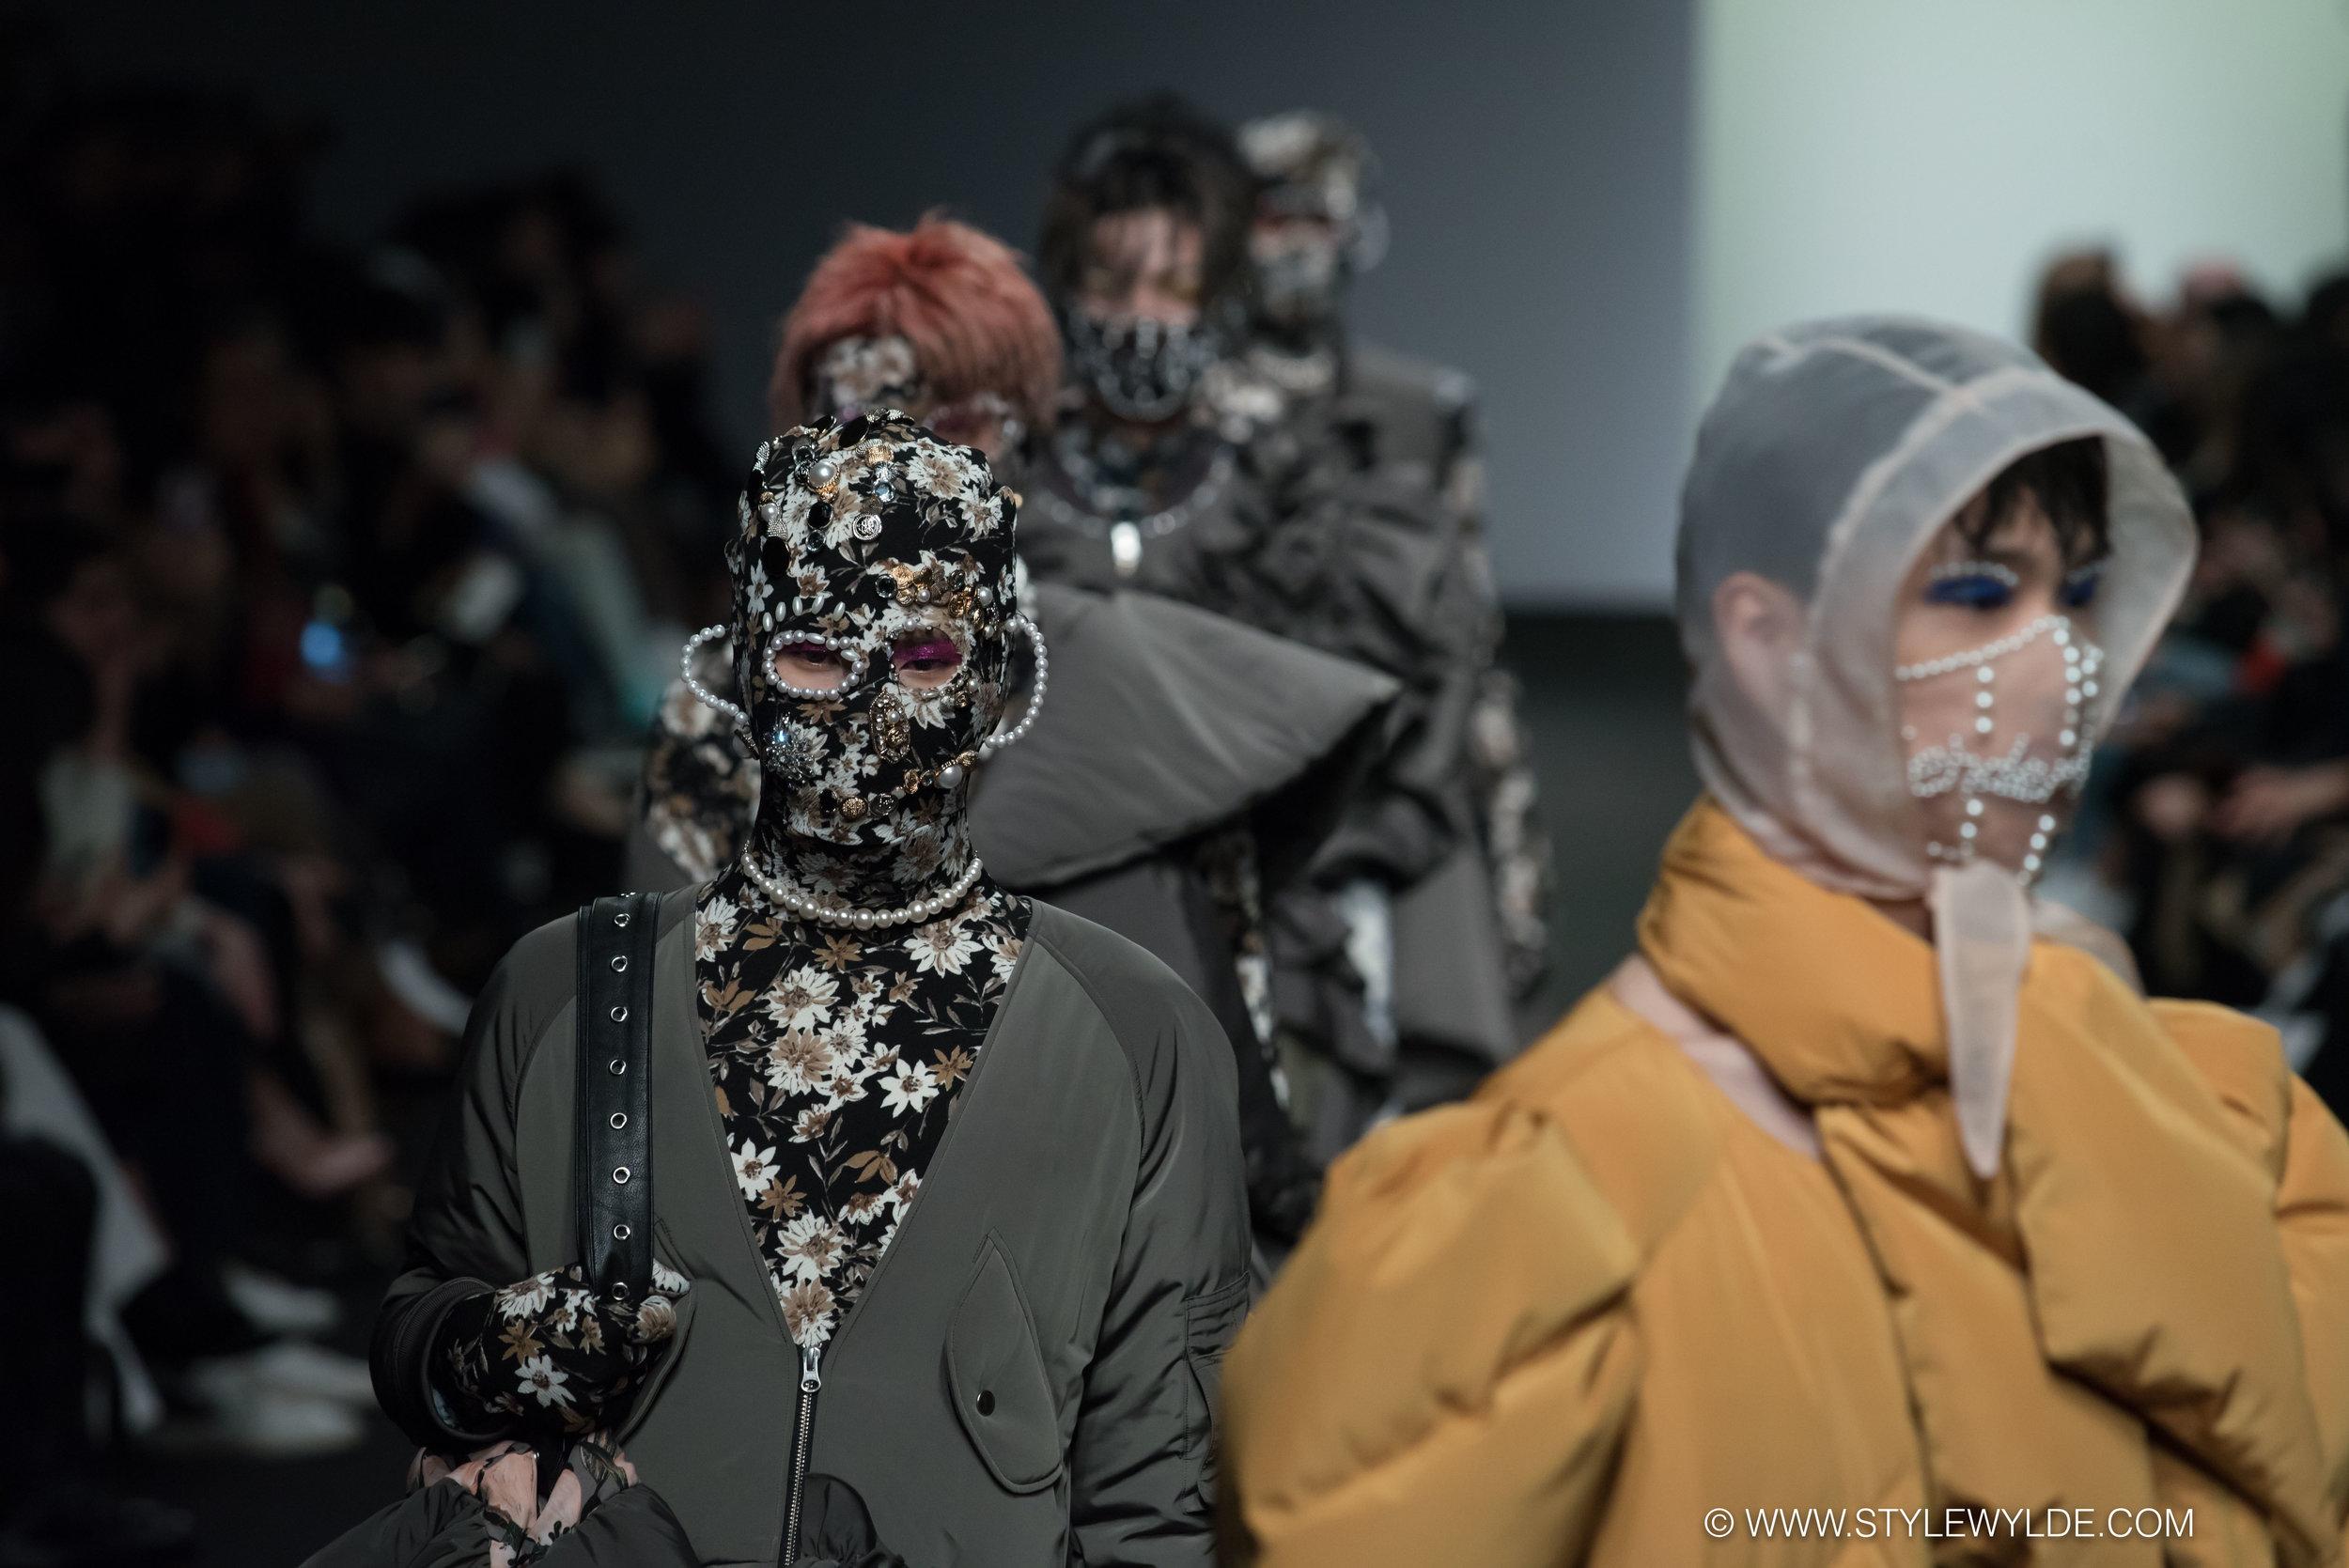 stylewylde_sfw_blindness_fw_2018-31.jpg